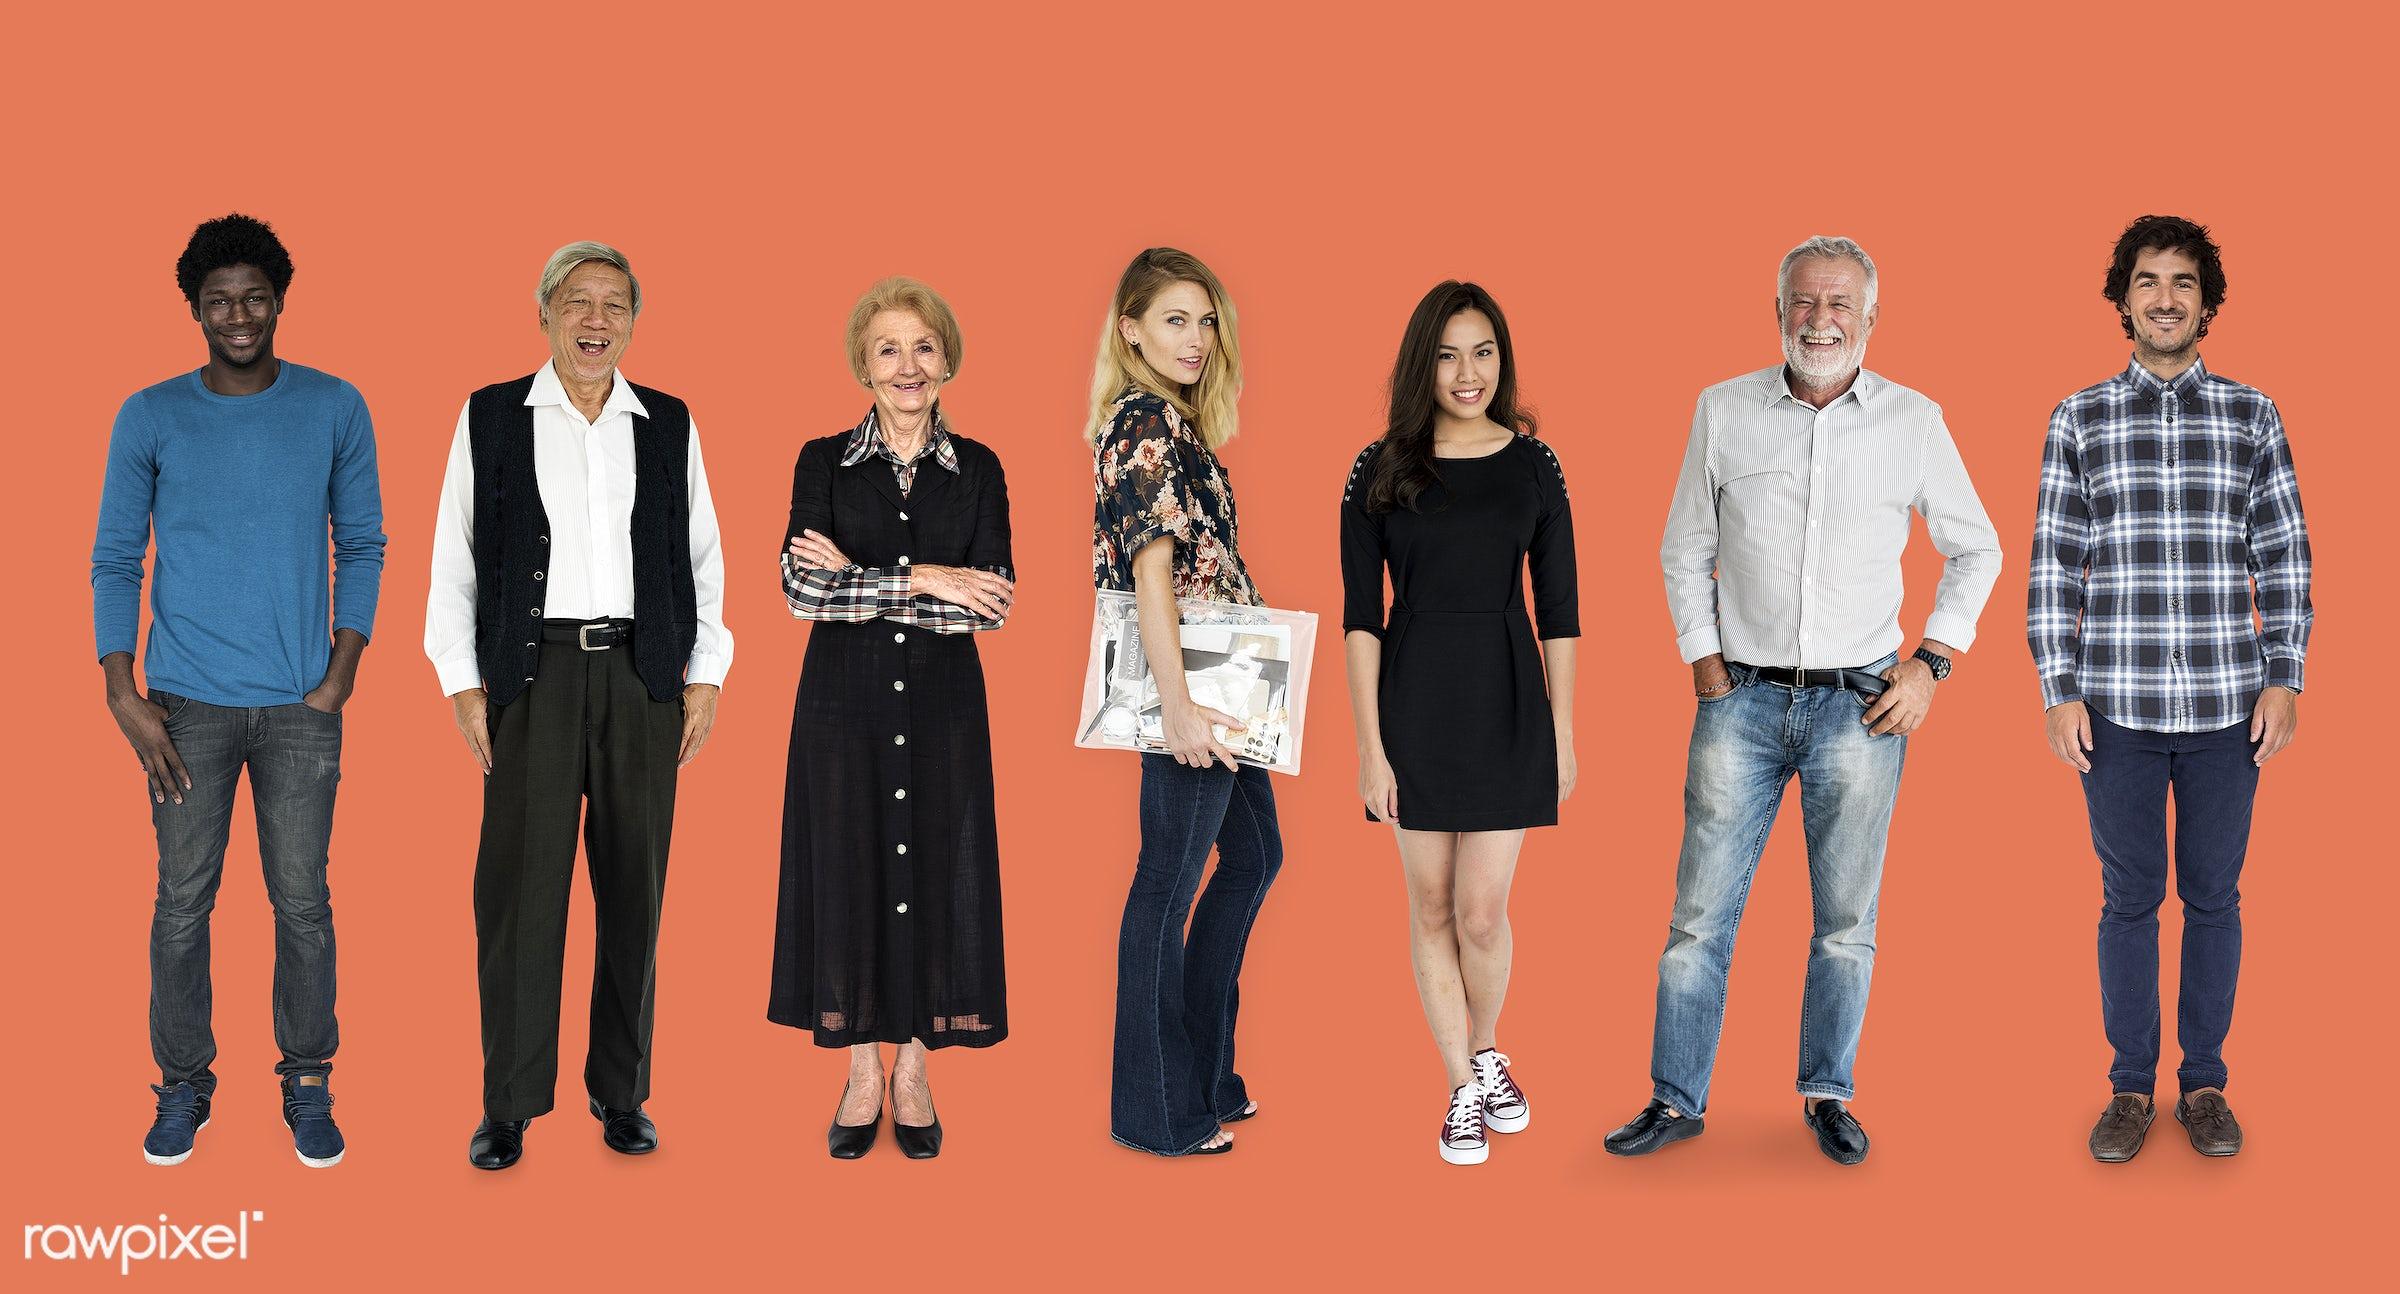 gentlemen, studio, person, diverse, set, retired, retire, people, attraction, together, asian, caucasian, retirement, life,...